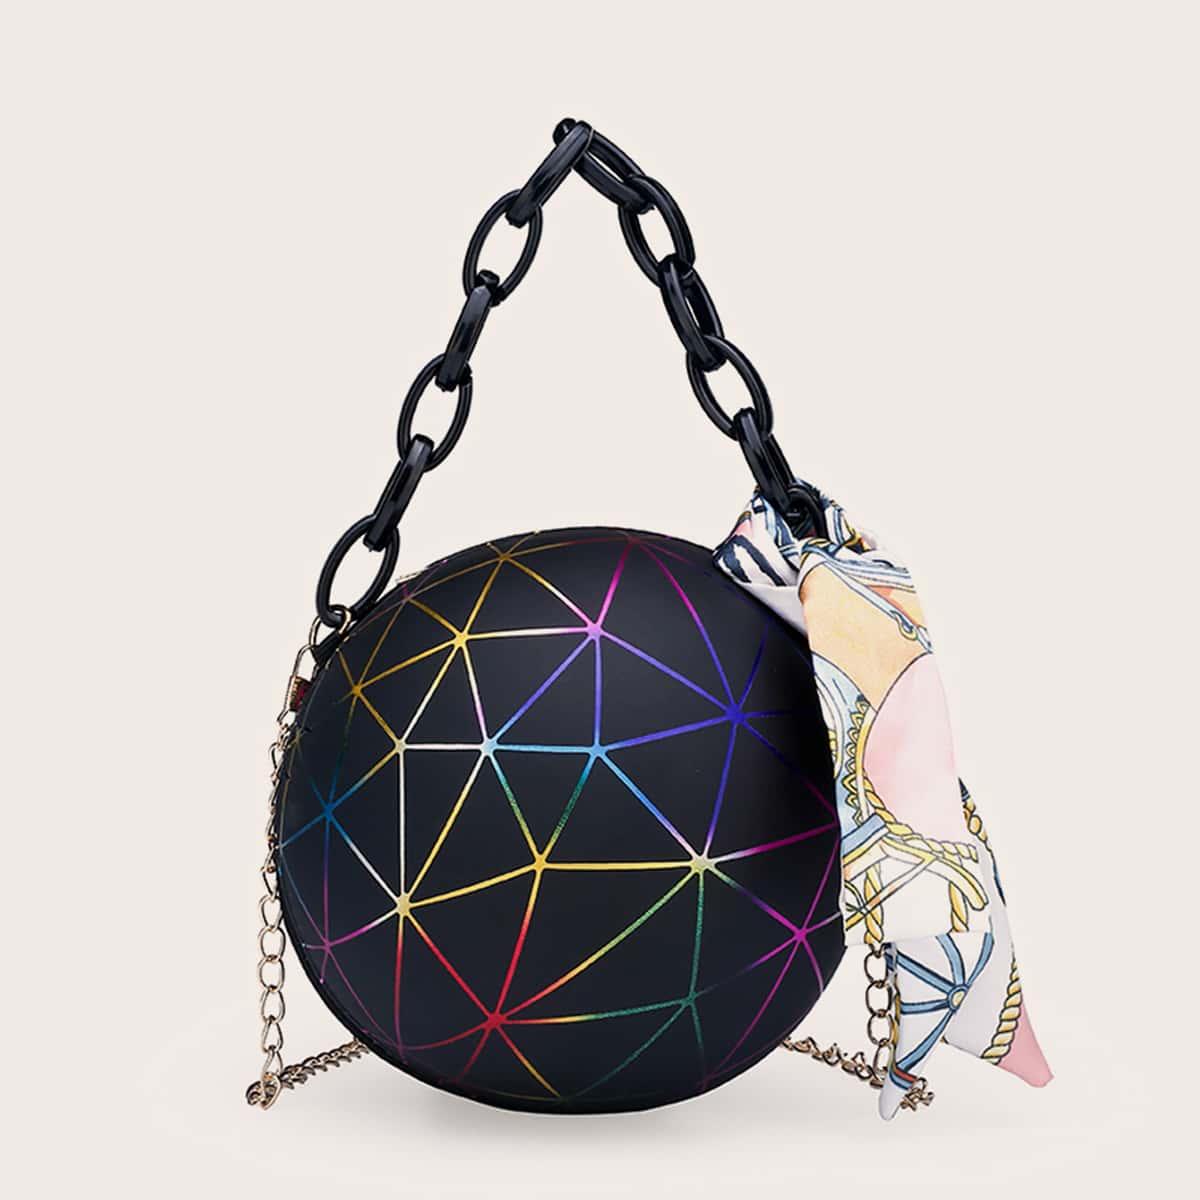 SHEIN / Twilly Scarf Decor Ball Shaped Chain Bag